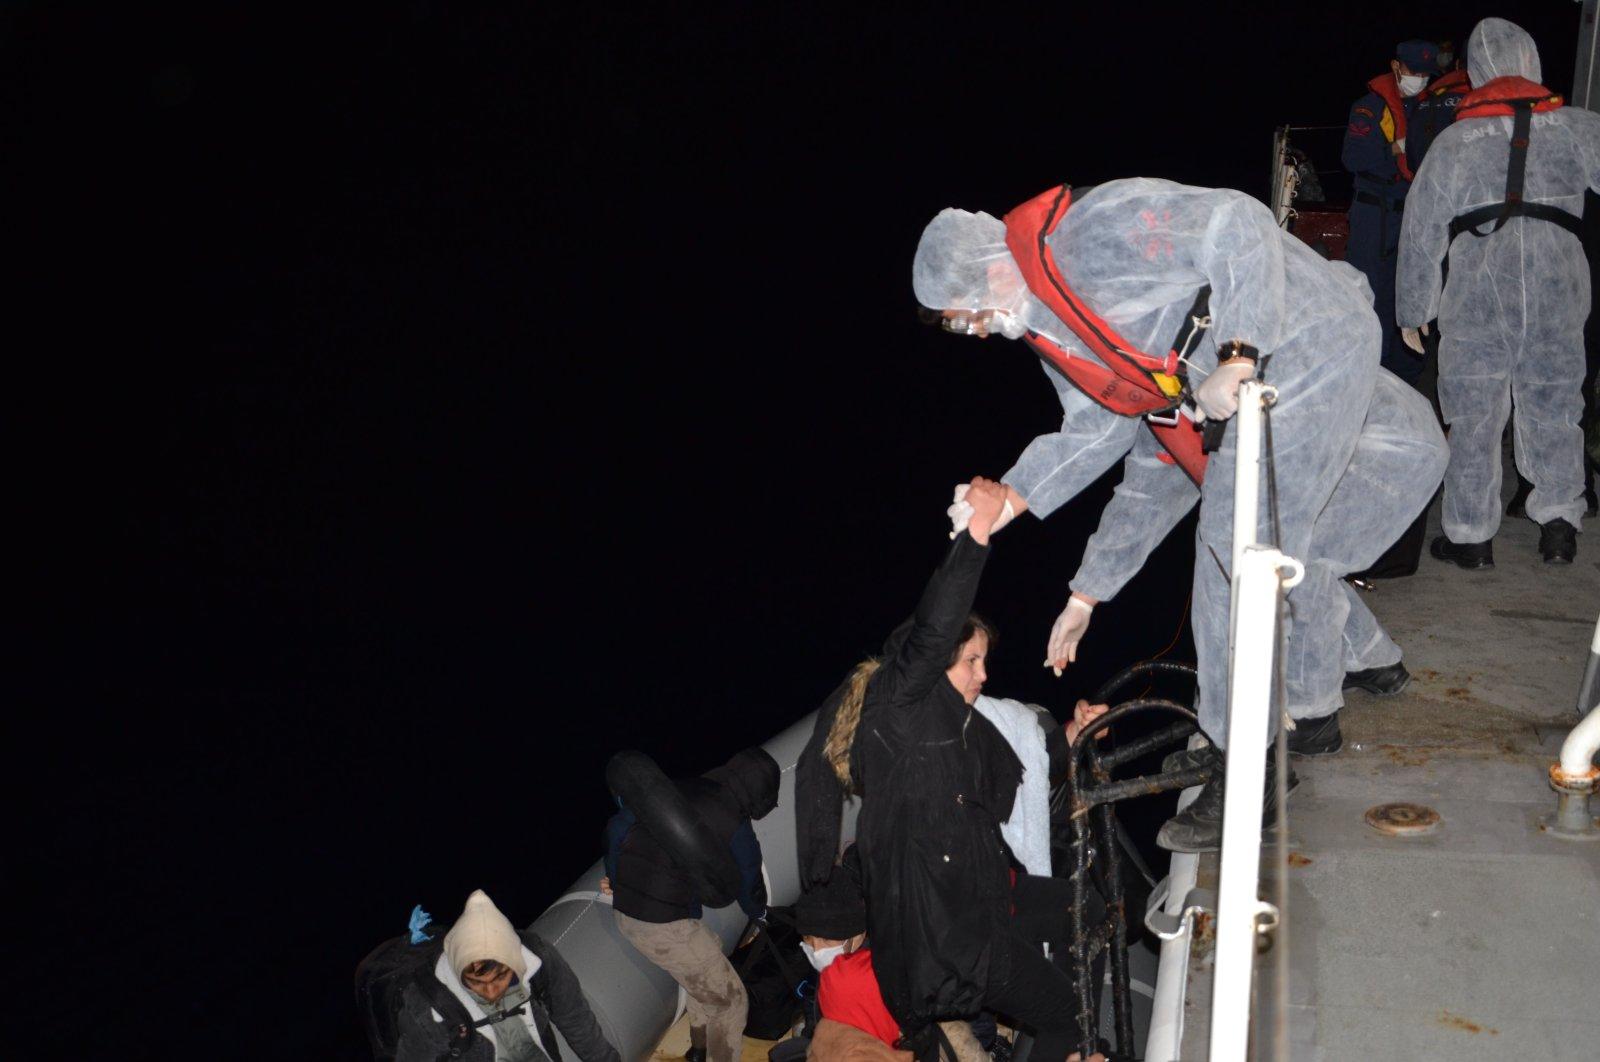 Turkish Coast Guard rescues irregular migrants pushed into Turkish territorial waters by Greek coast guard, Izmir, Turkey, March 29, 2021. (IHA Photo)